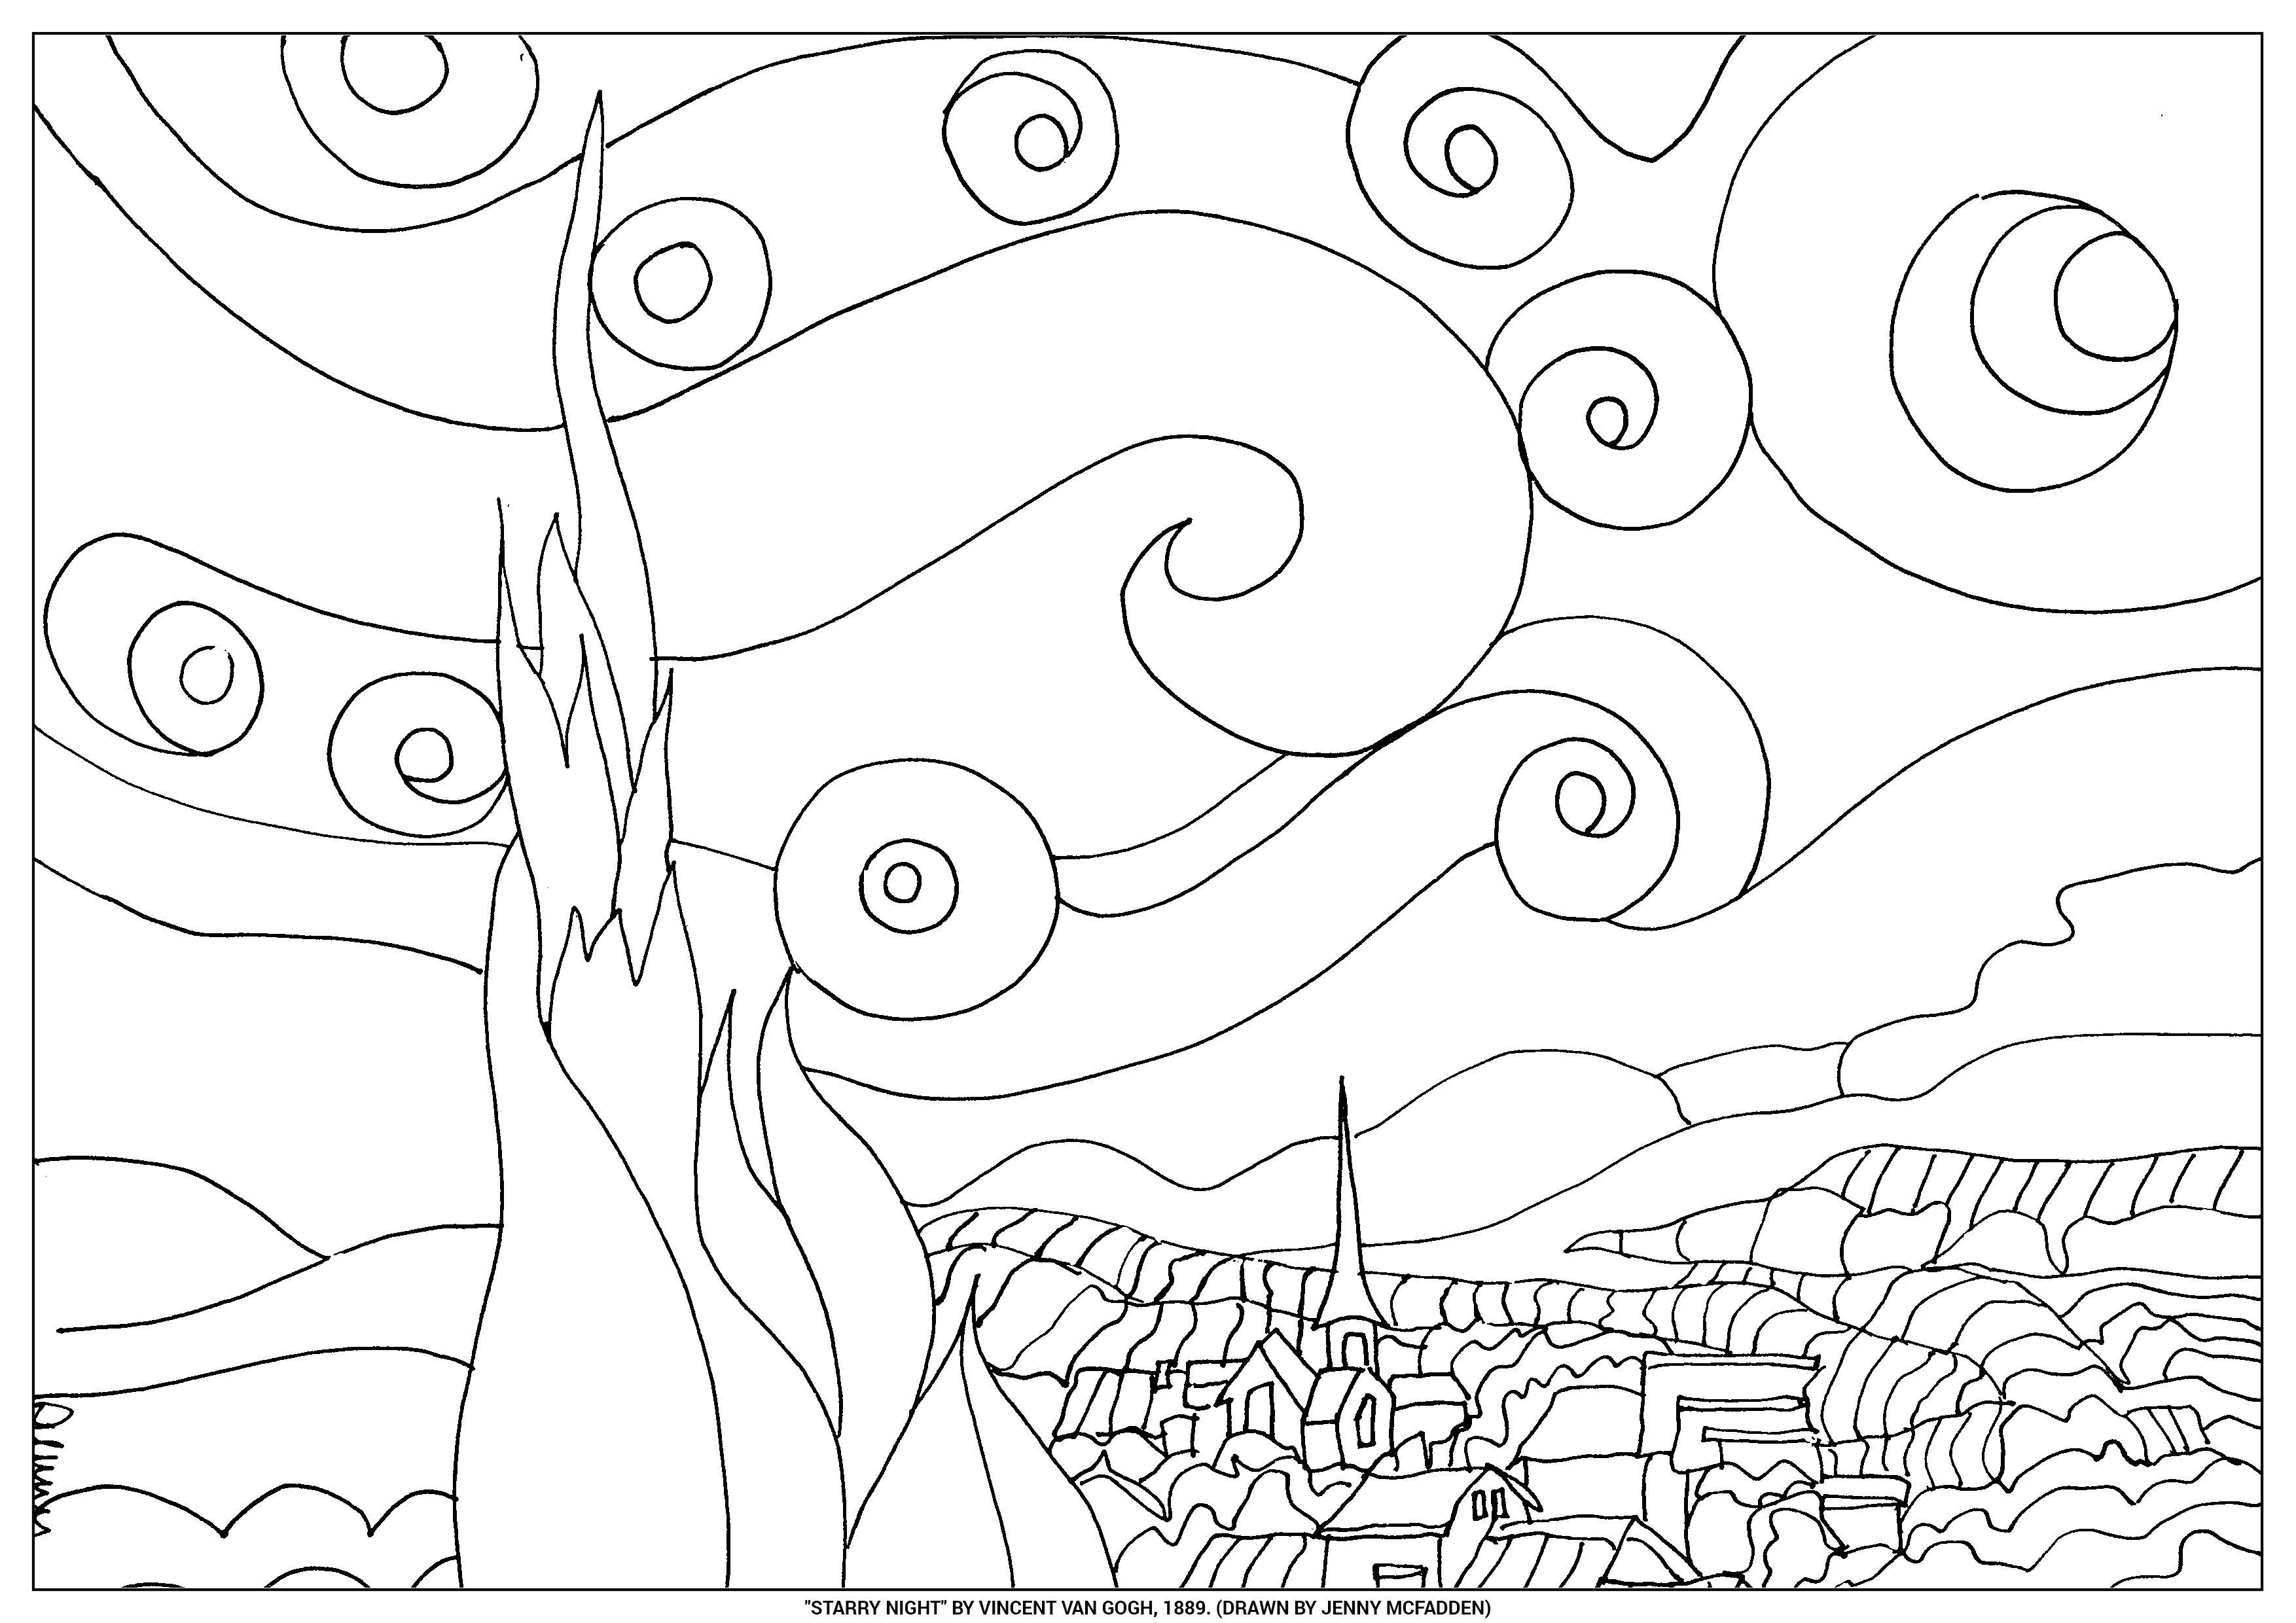 starry night van gogh template final aquarela paisagem. Black Bedroom Furniture Sets. Home Design Ideas